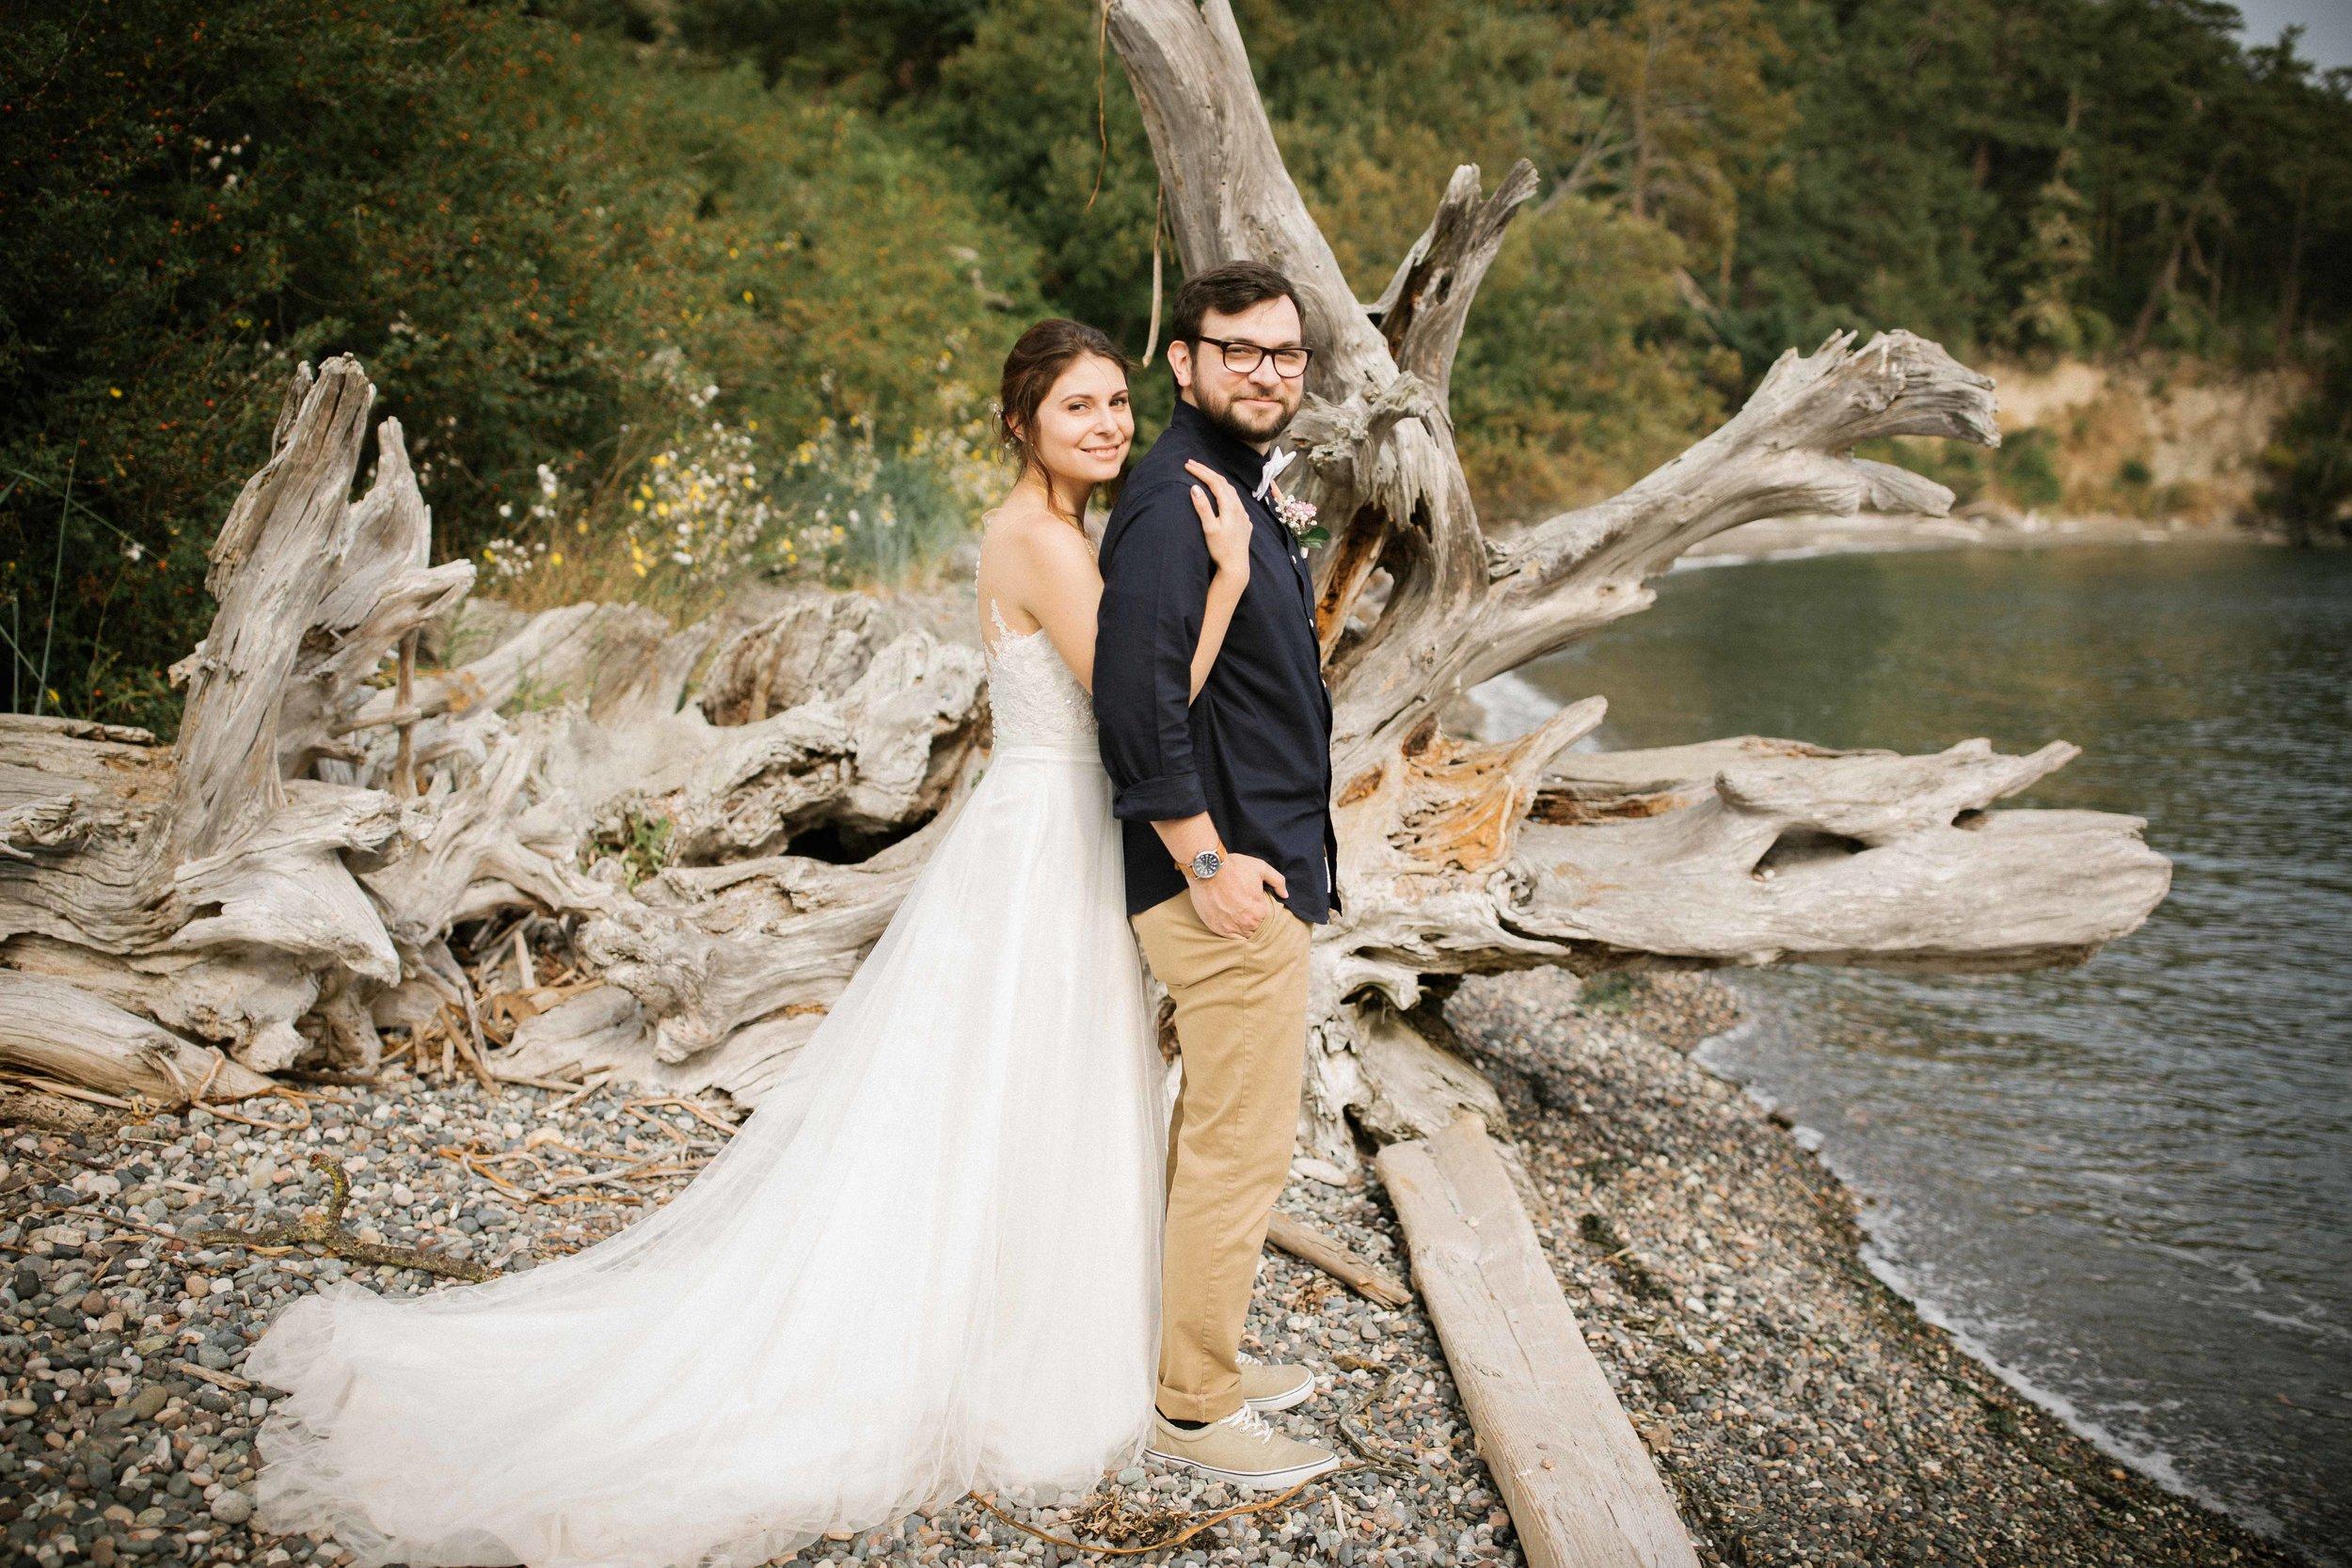 deception-pass-wedding-55.jpg